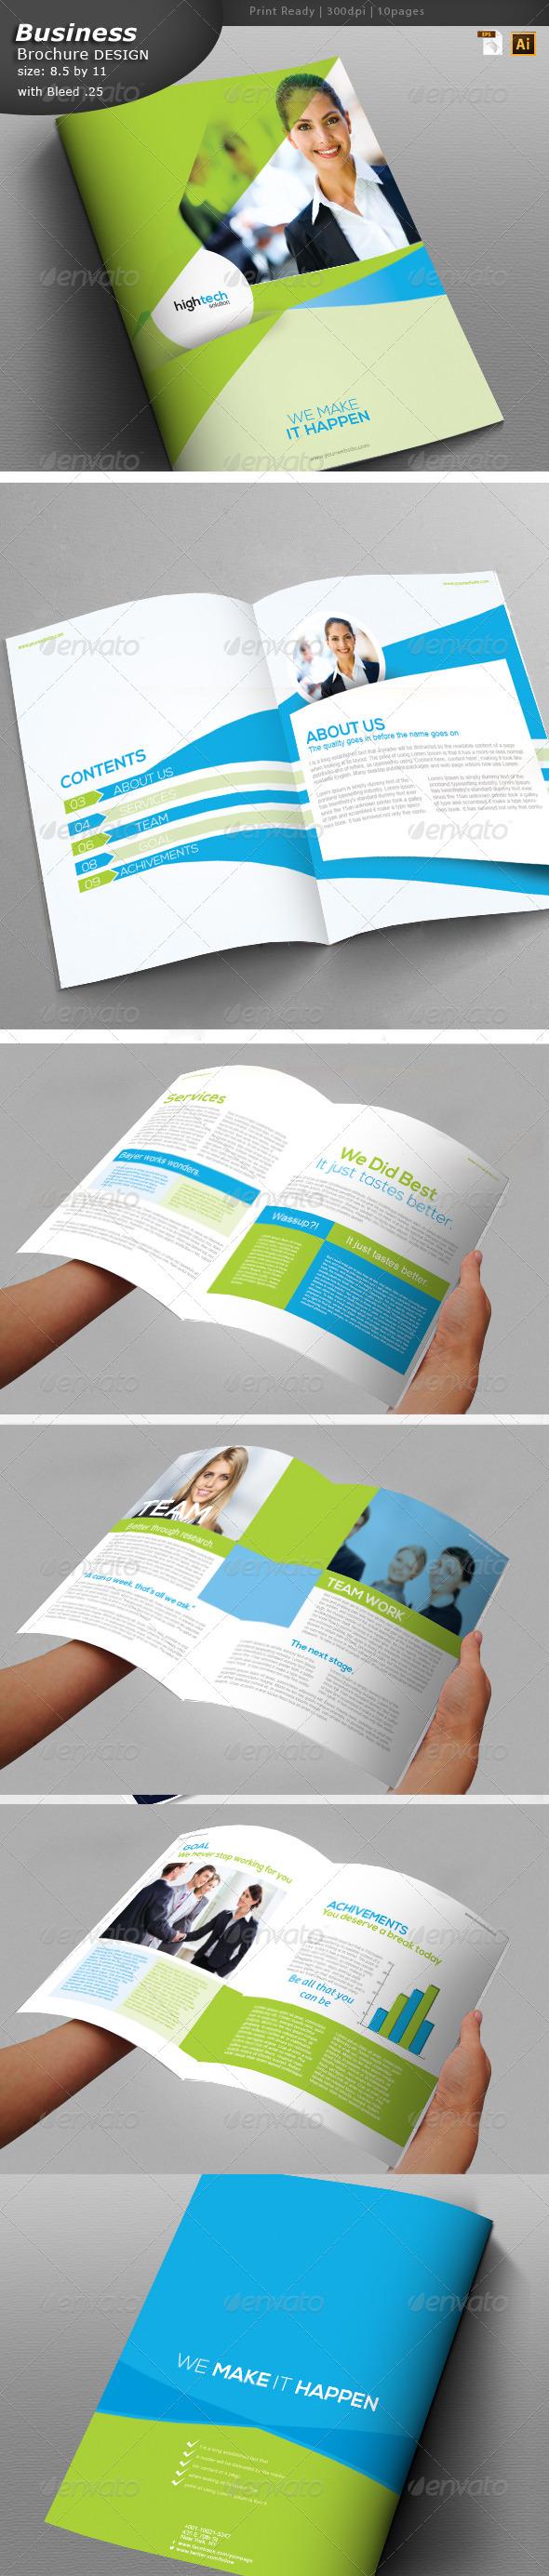 GraphicRiver Business Brochure Design 6083473